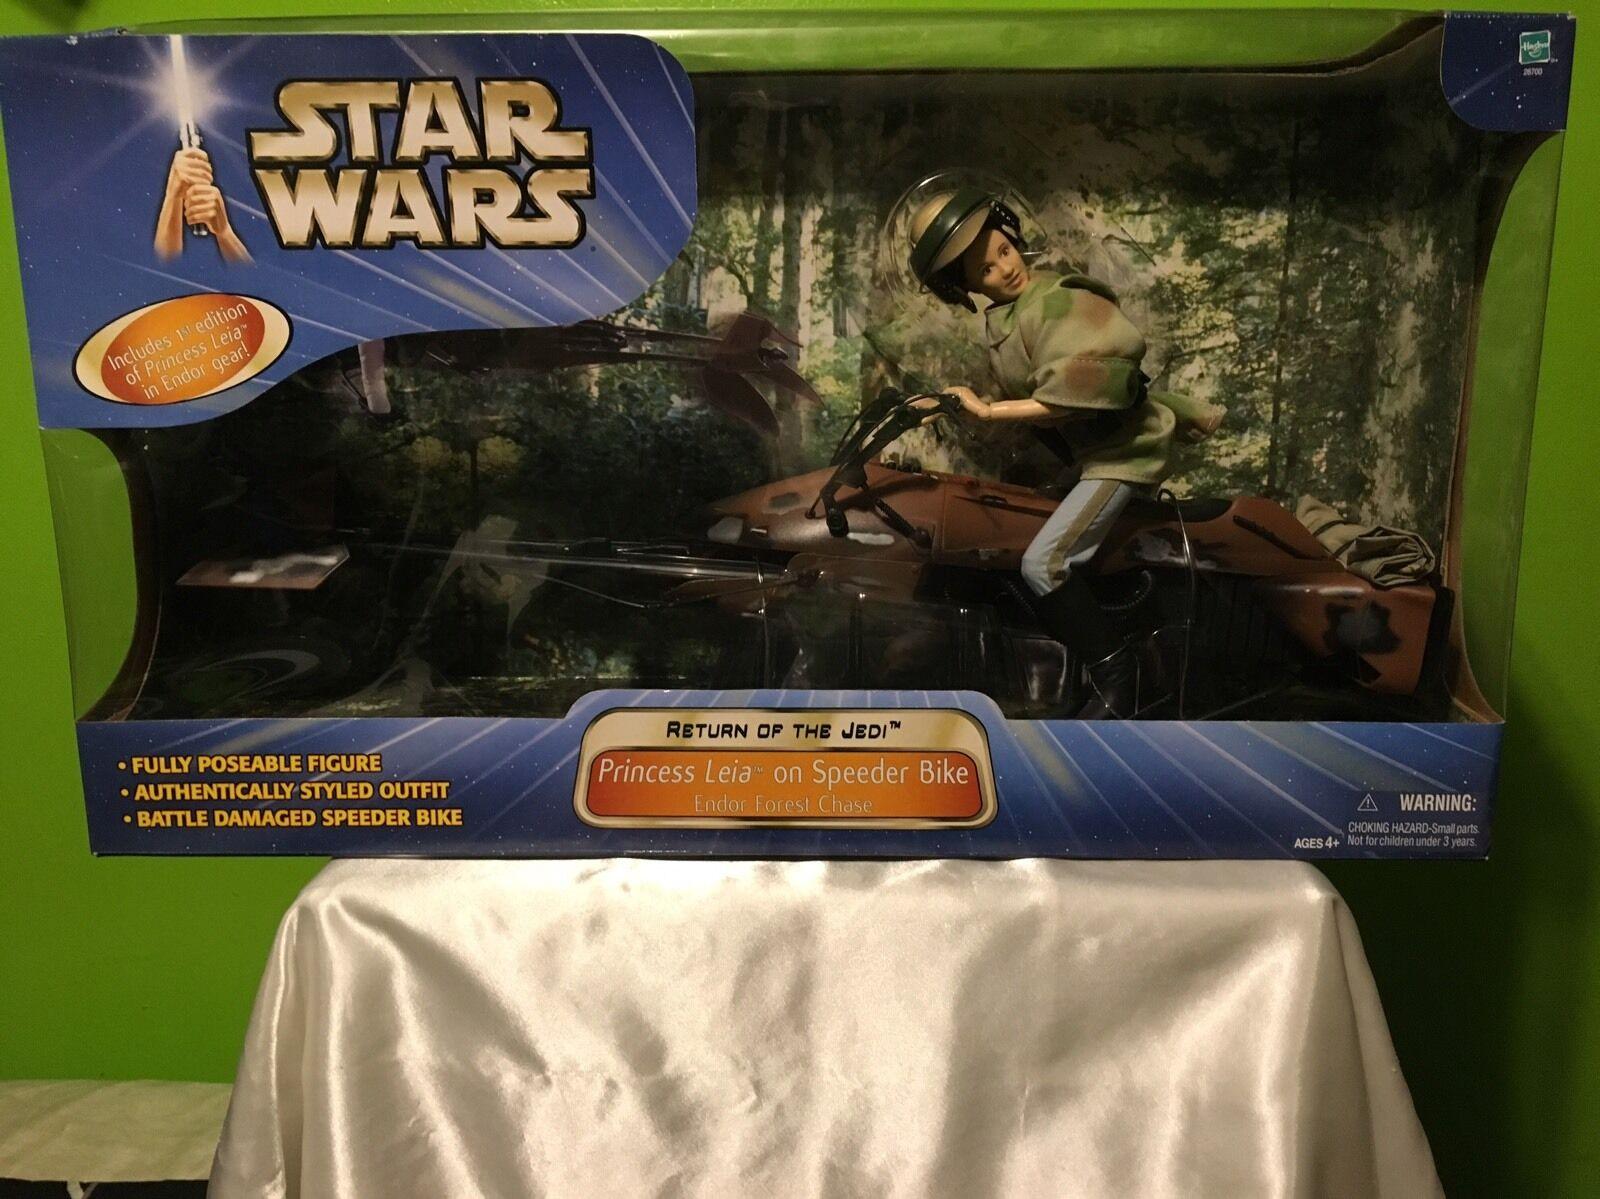 New Unopened Star Wars Princess Leia on Speeder Bike 12 Figure by Hasbro